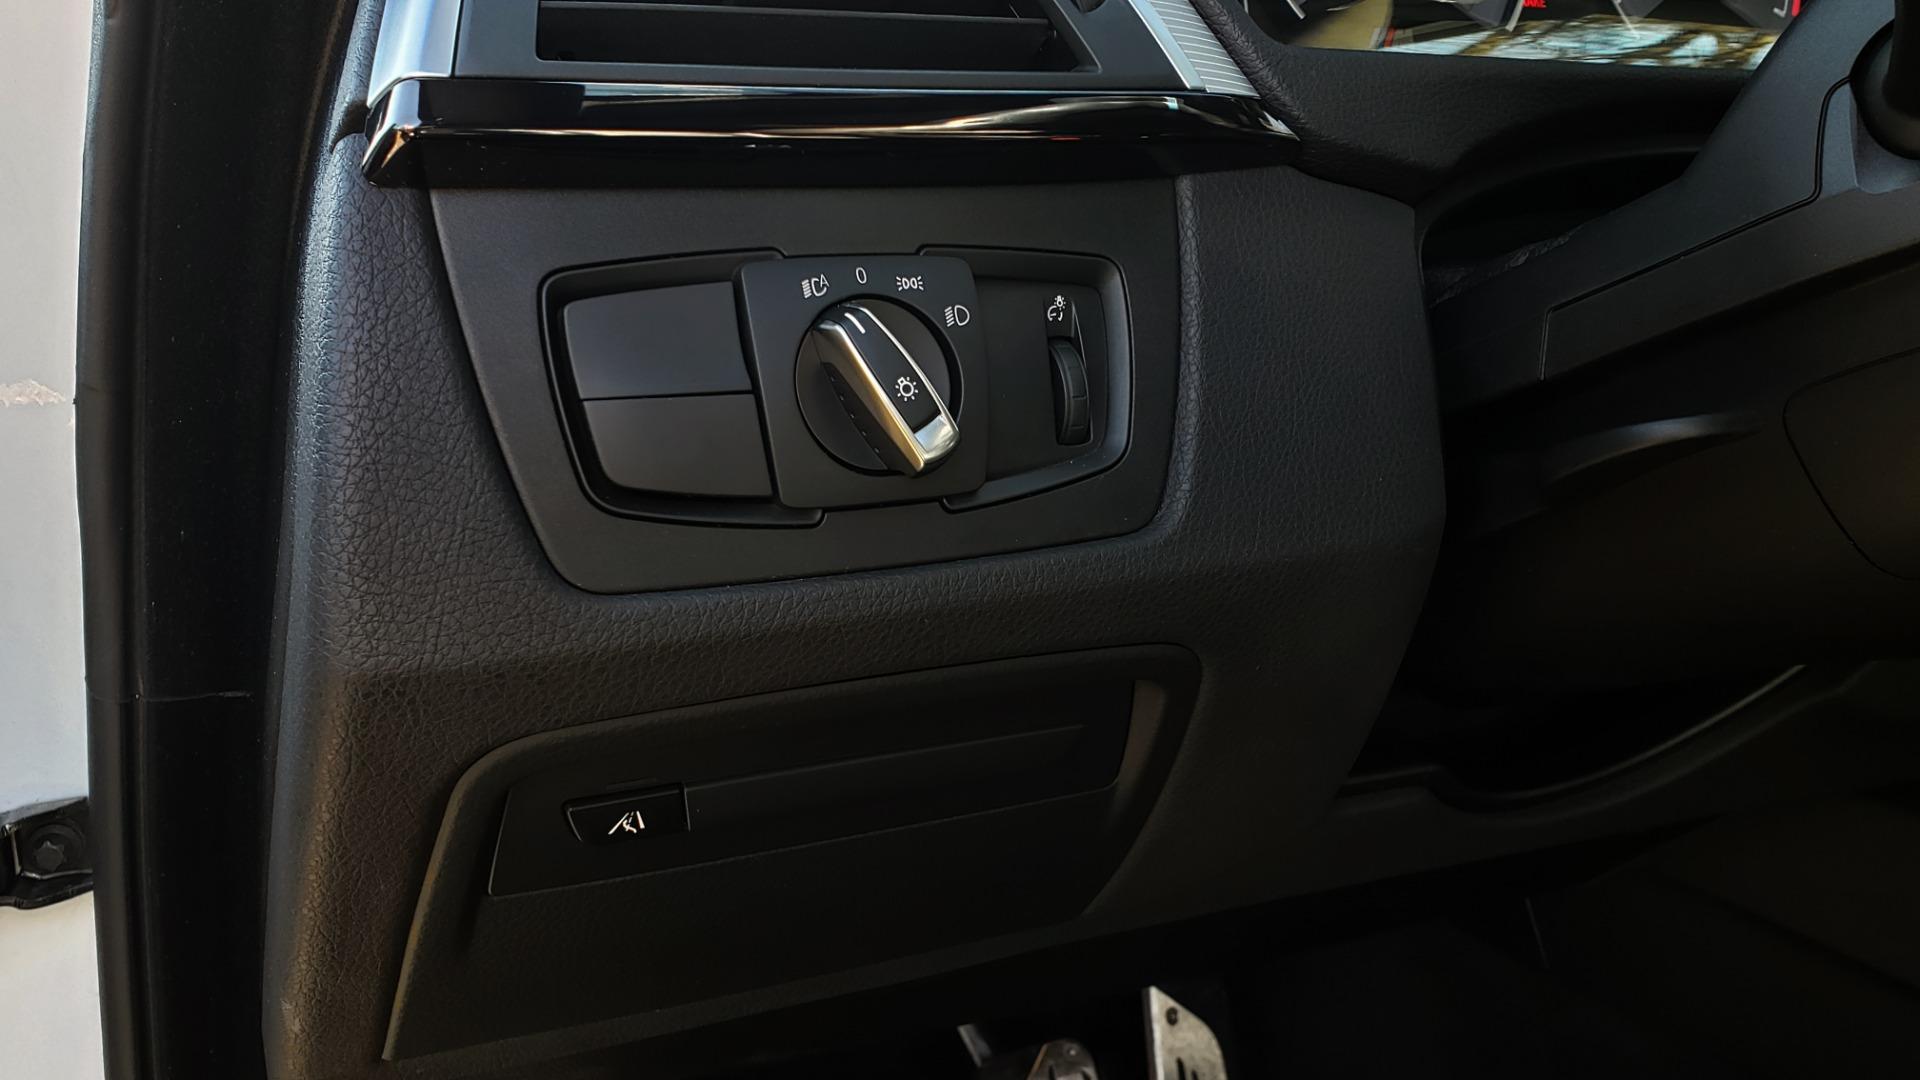 Used 2018 BMW M4 COMP PKG / EXEC / M-DRIVER / PARK CNTRL / ACTIVE BLIND SPOT for sale $45,449 at Formula Imports in Charlotte NC 28227 40